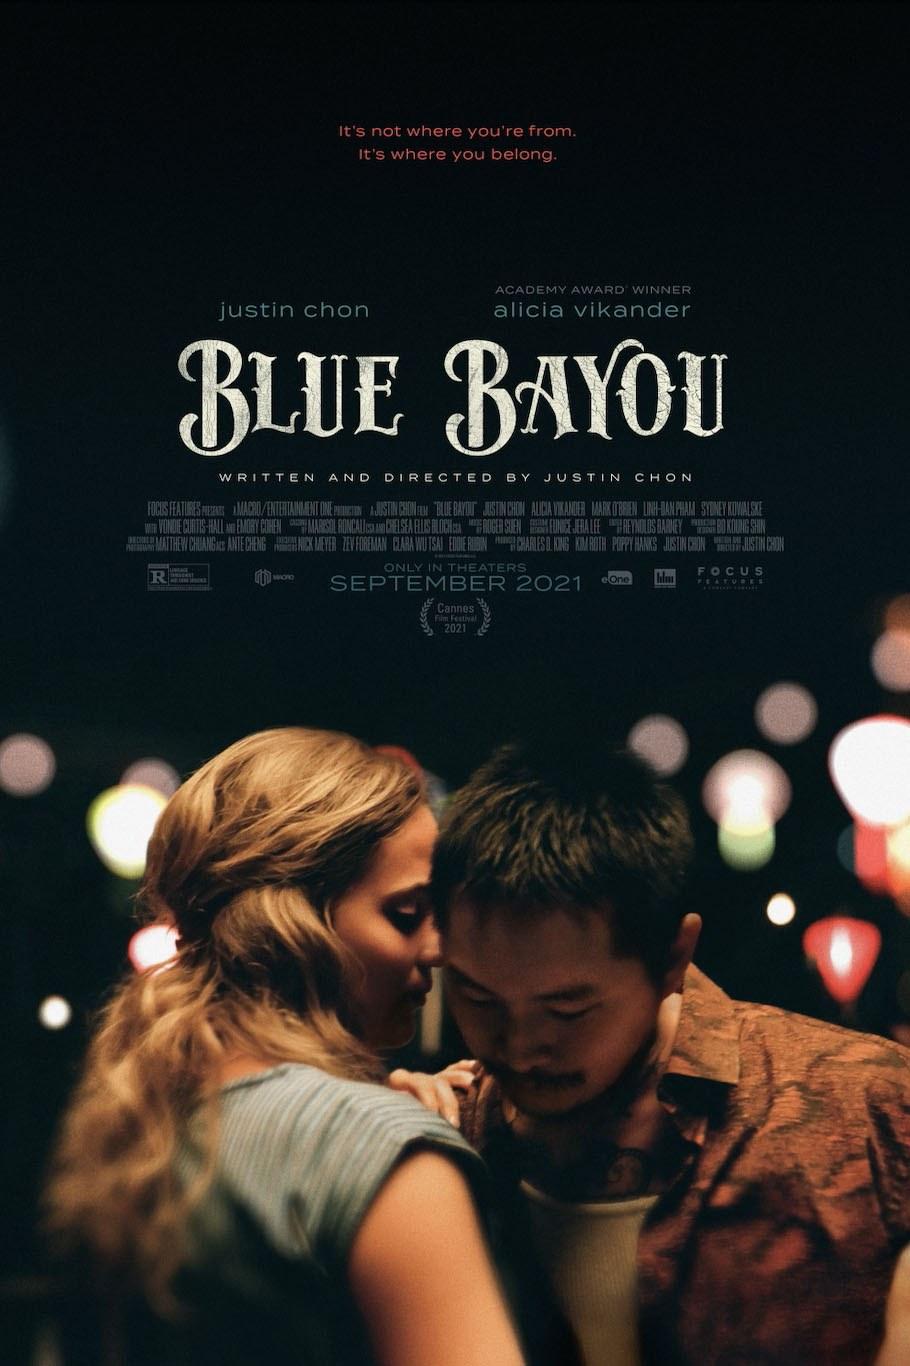 Blue Bayou film poster